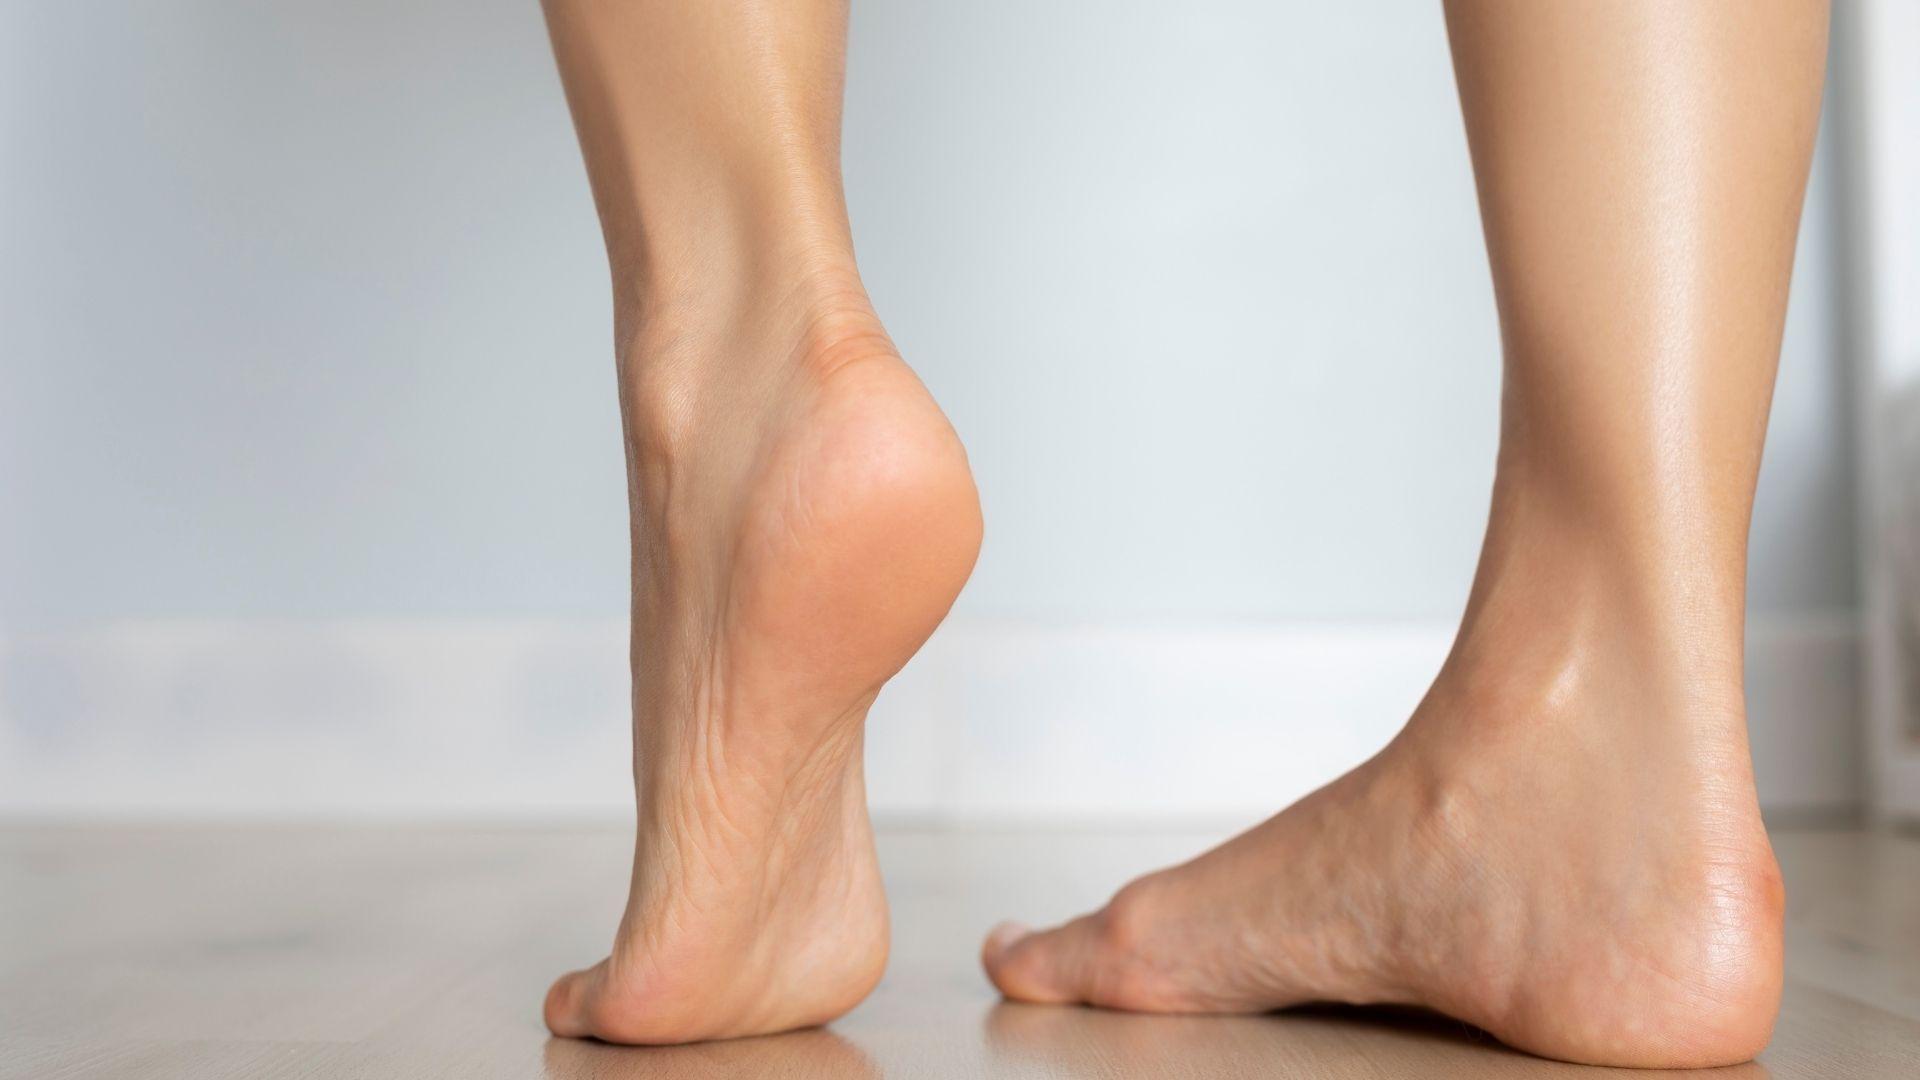 Cuida tus pies con esta rutina infalible